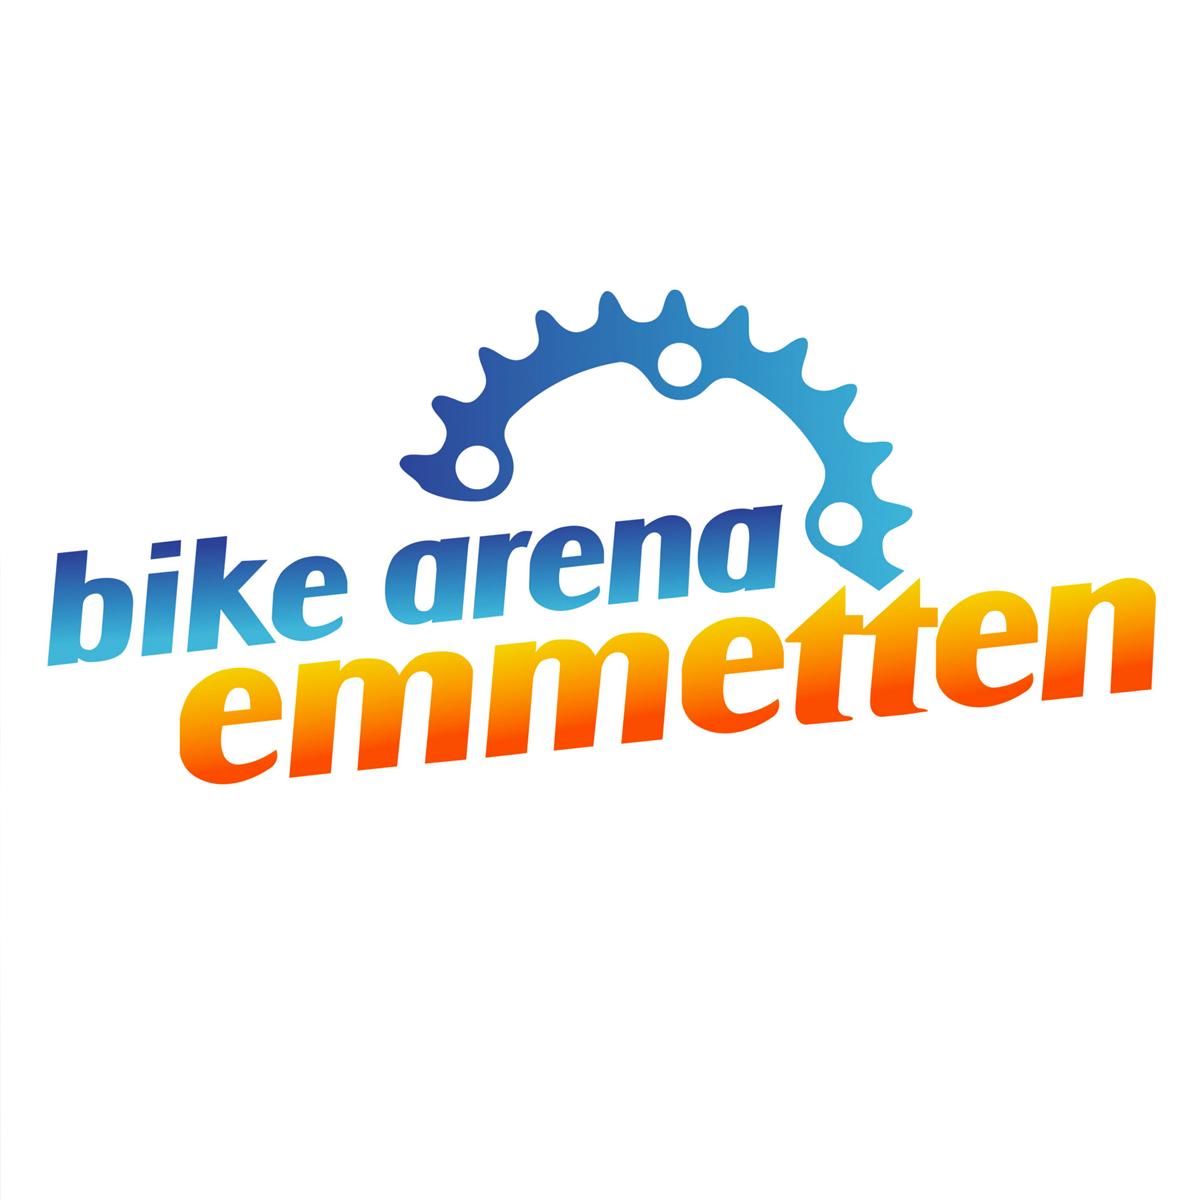 bike arena Emmetten